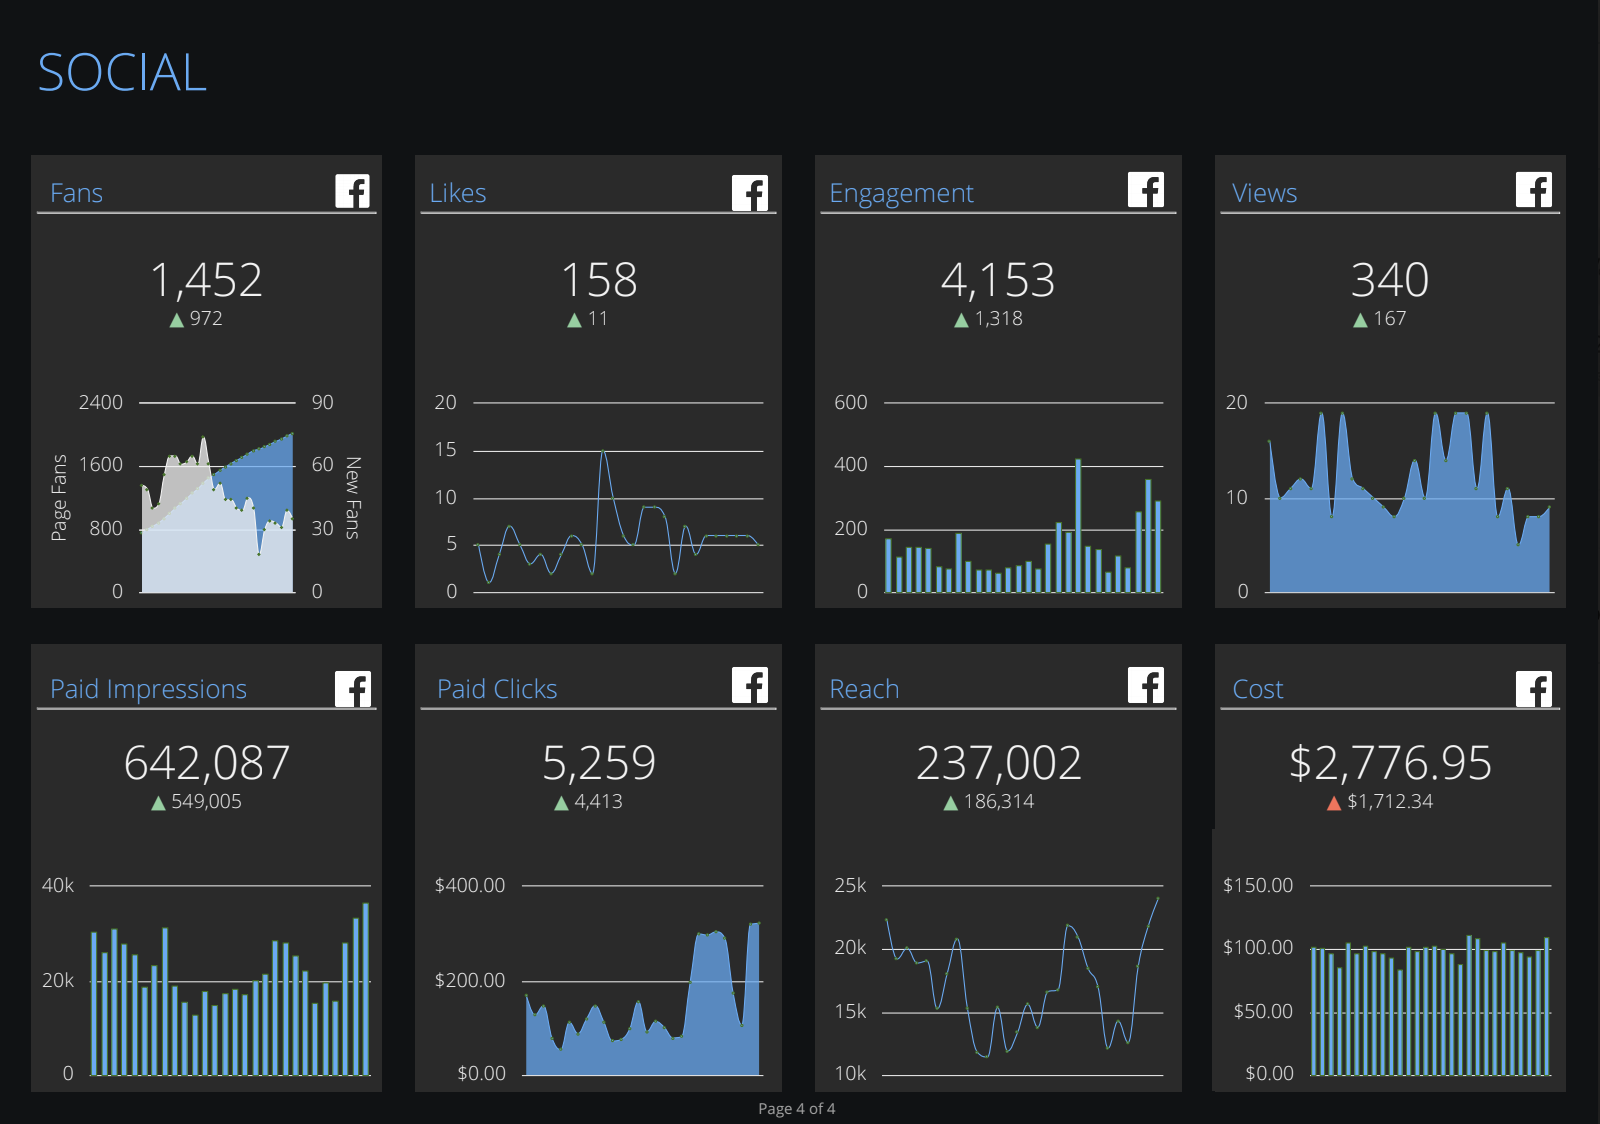 A social media marketing dashboard example from NinjaCat